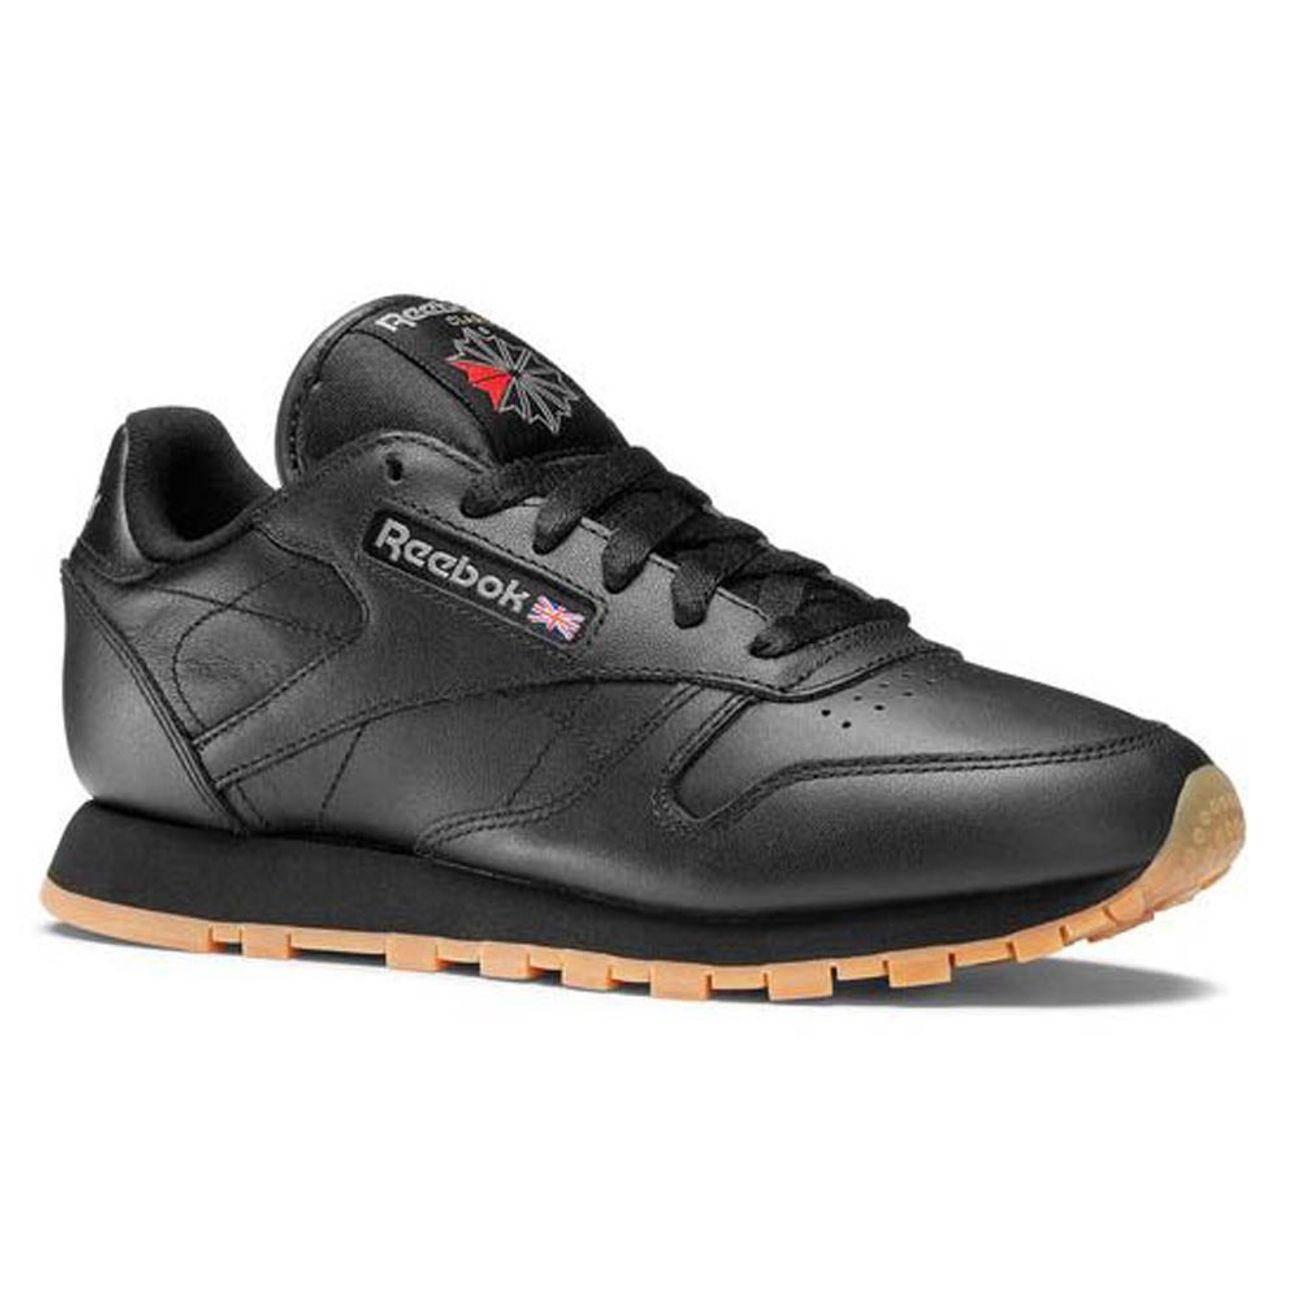 Reebok CherGo Classics Leather – Sport Pas Prix Et Classic Achat WIY92EDH